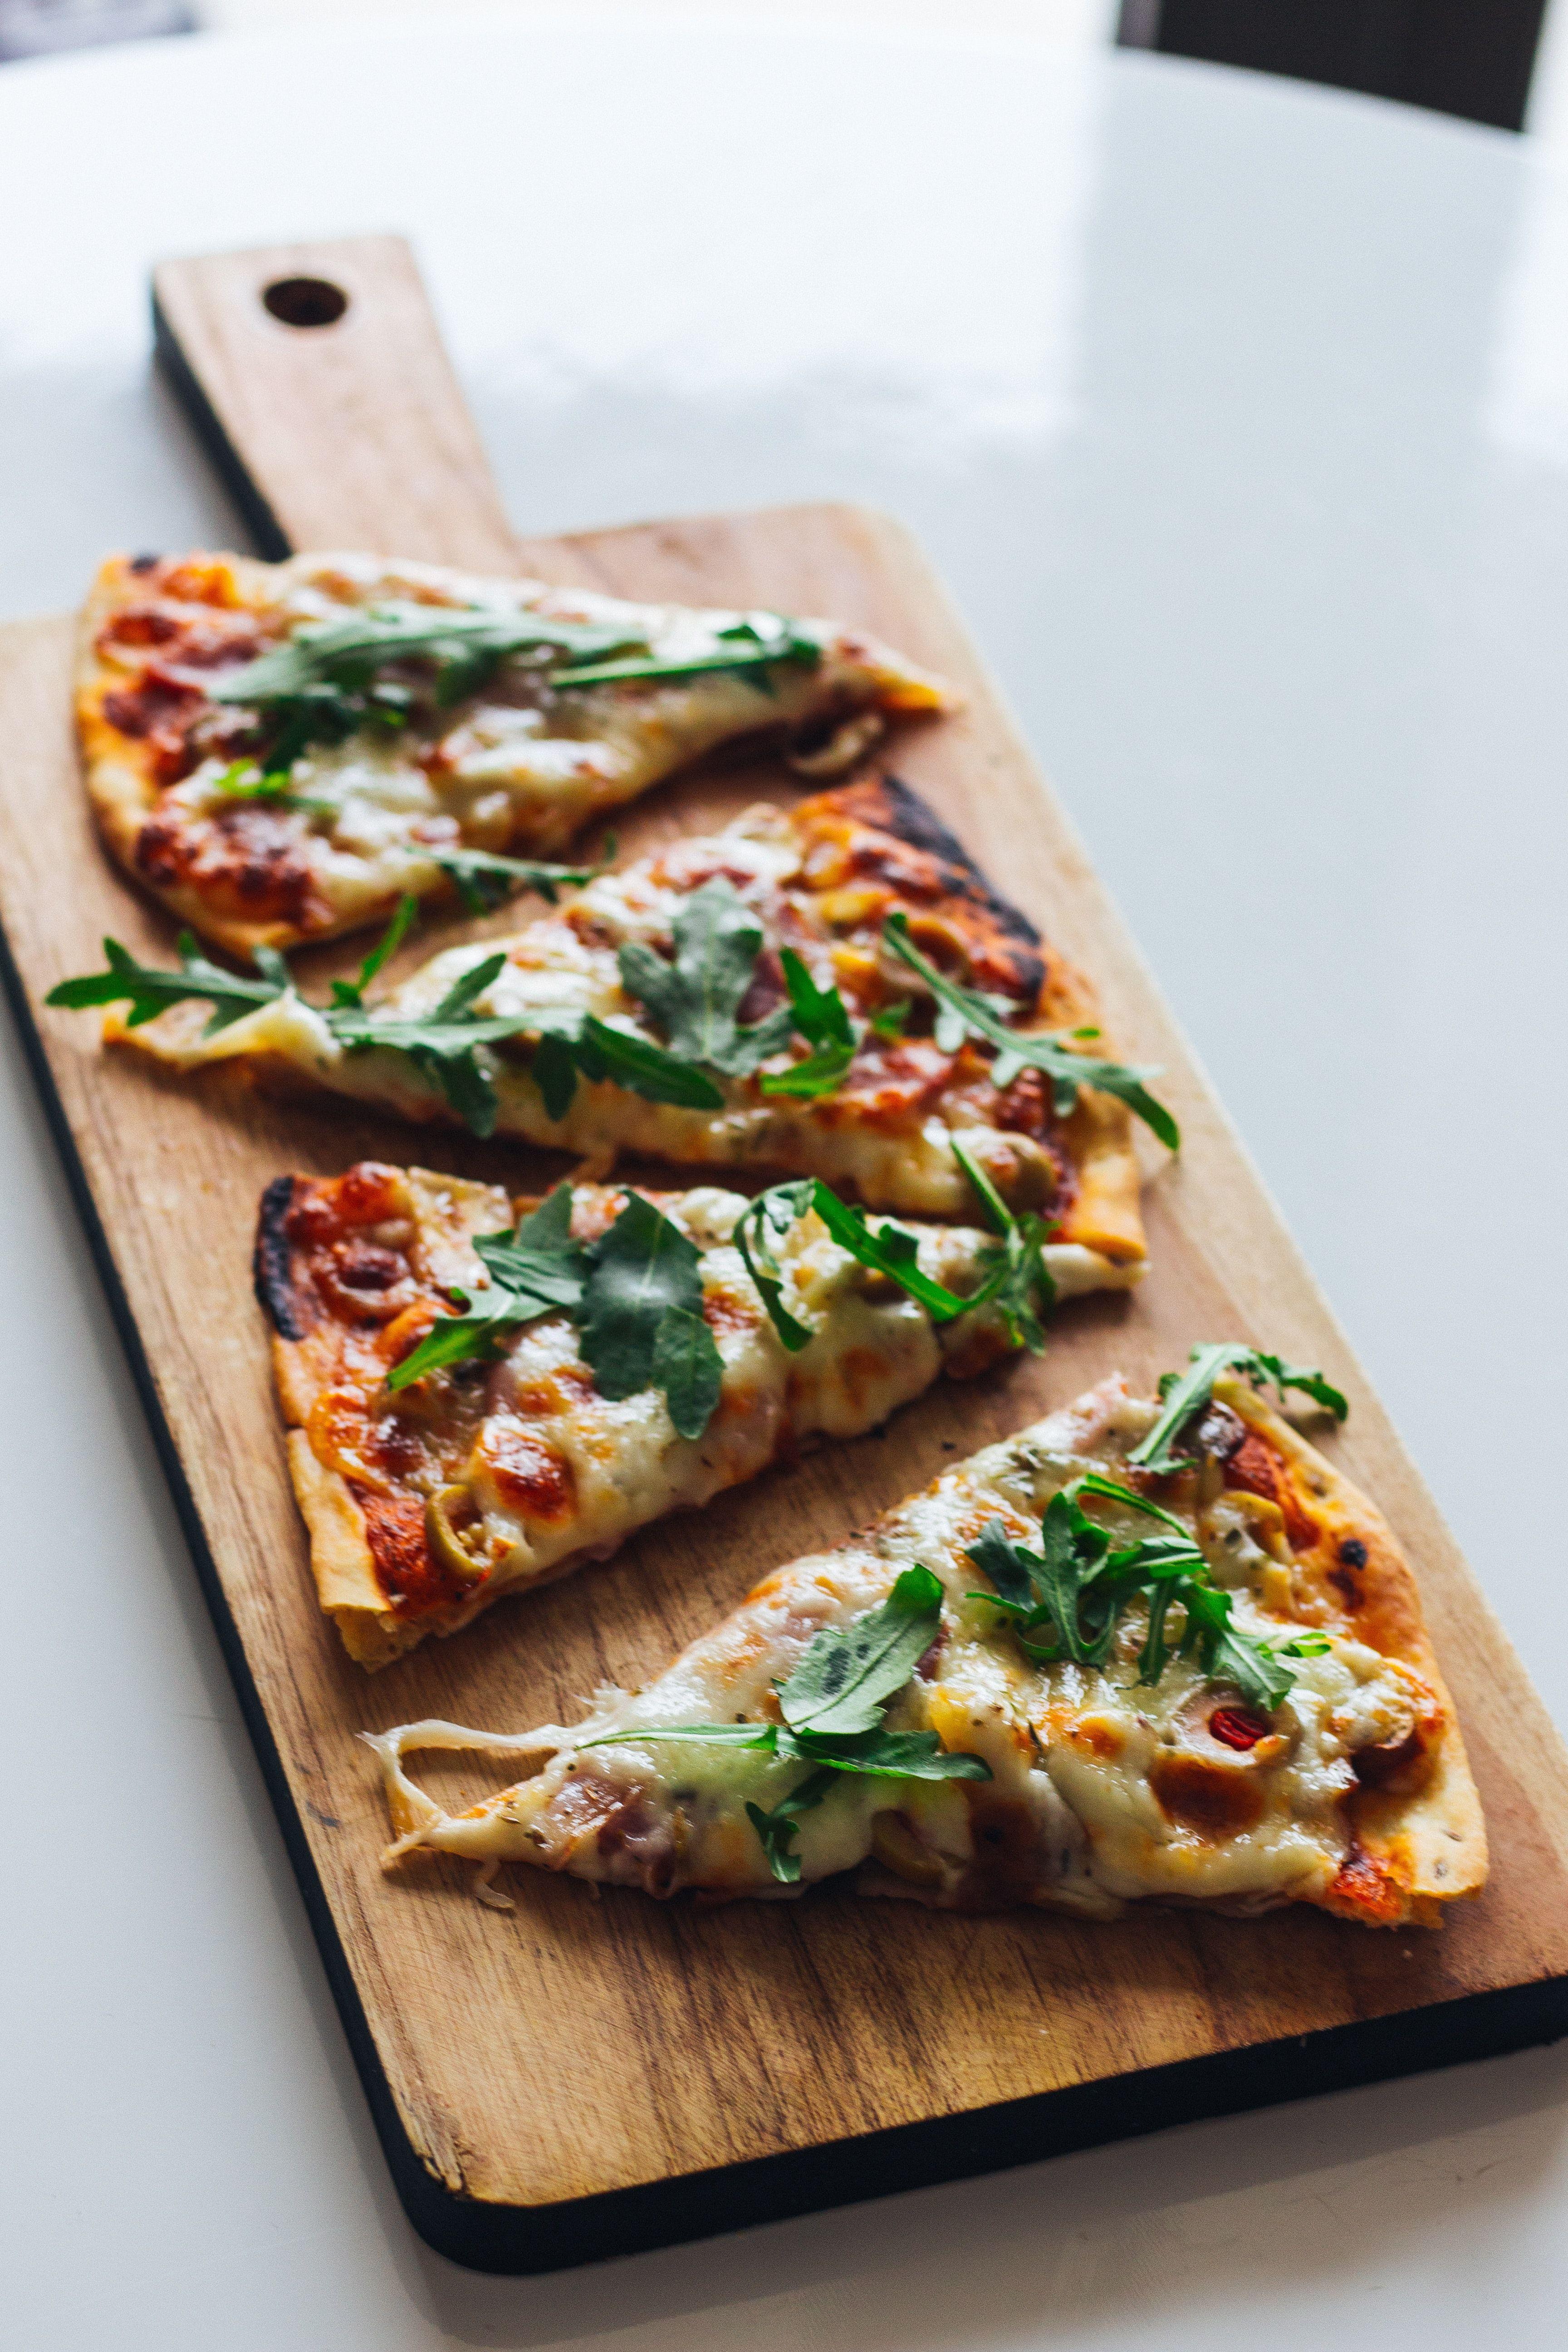 Pizza_slices_sahand-hoseini-bmvayjpf6mu-unsplash